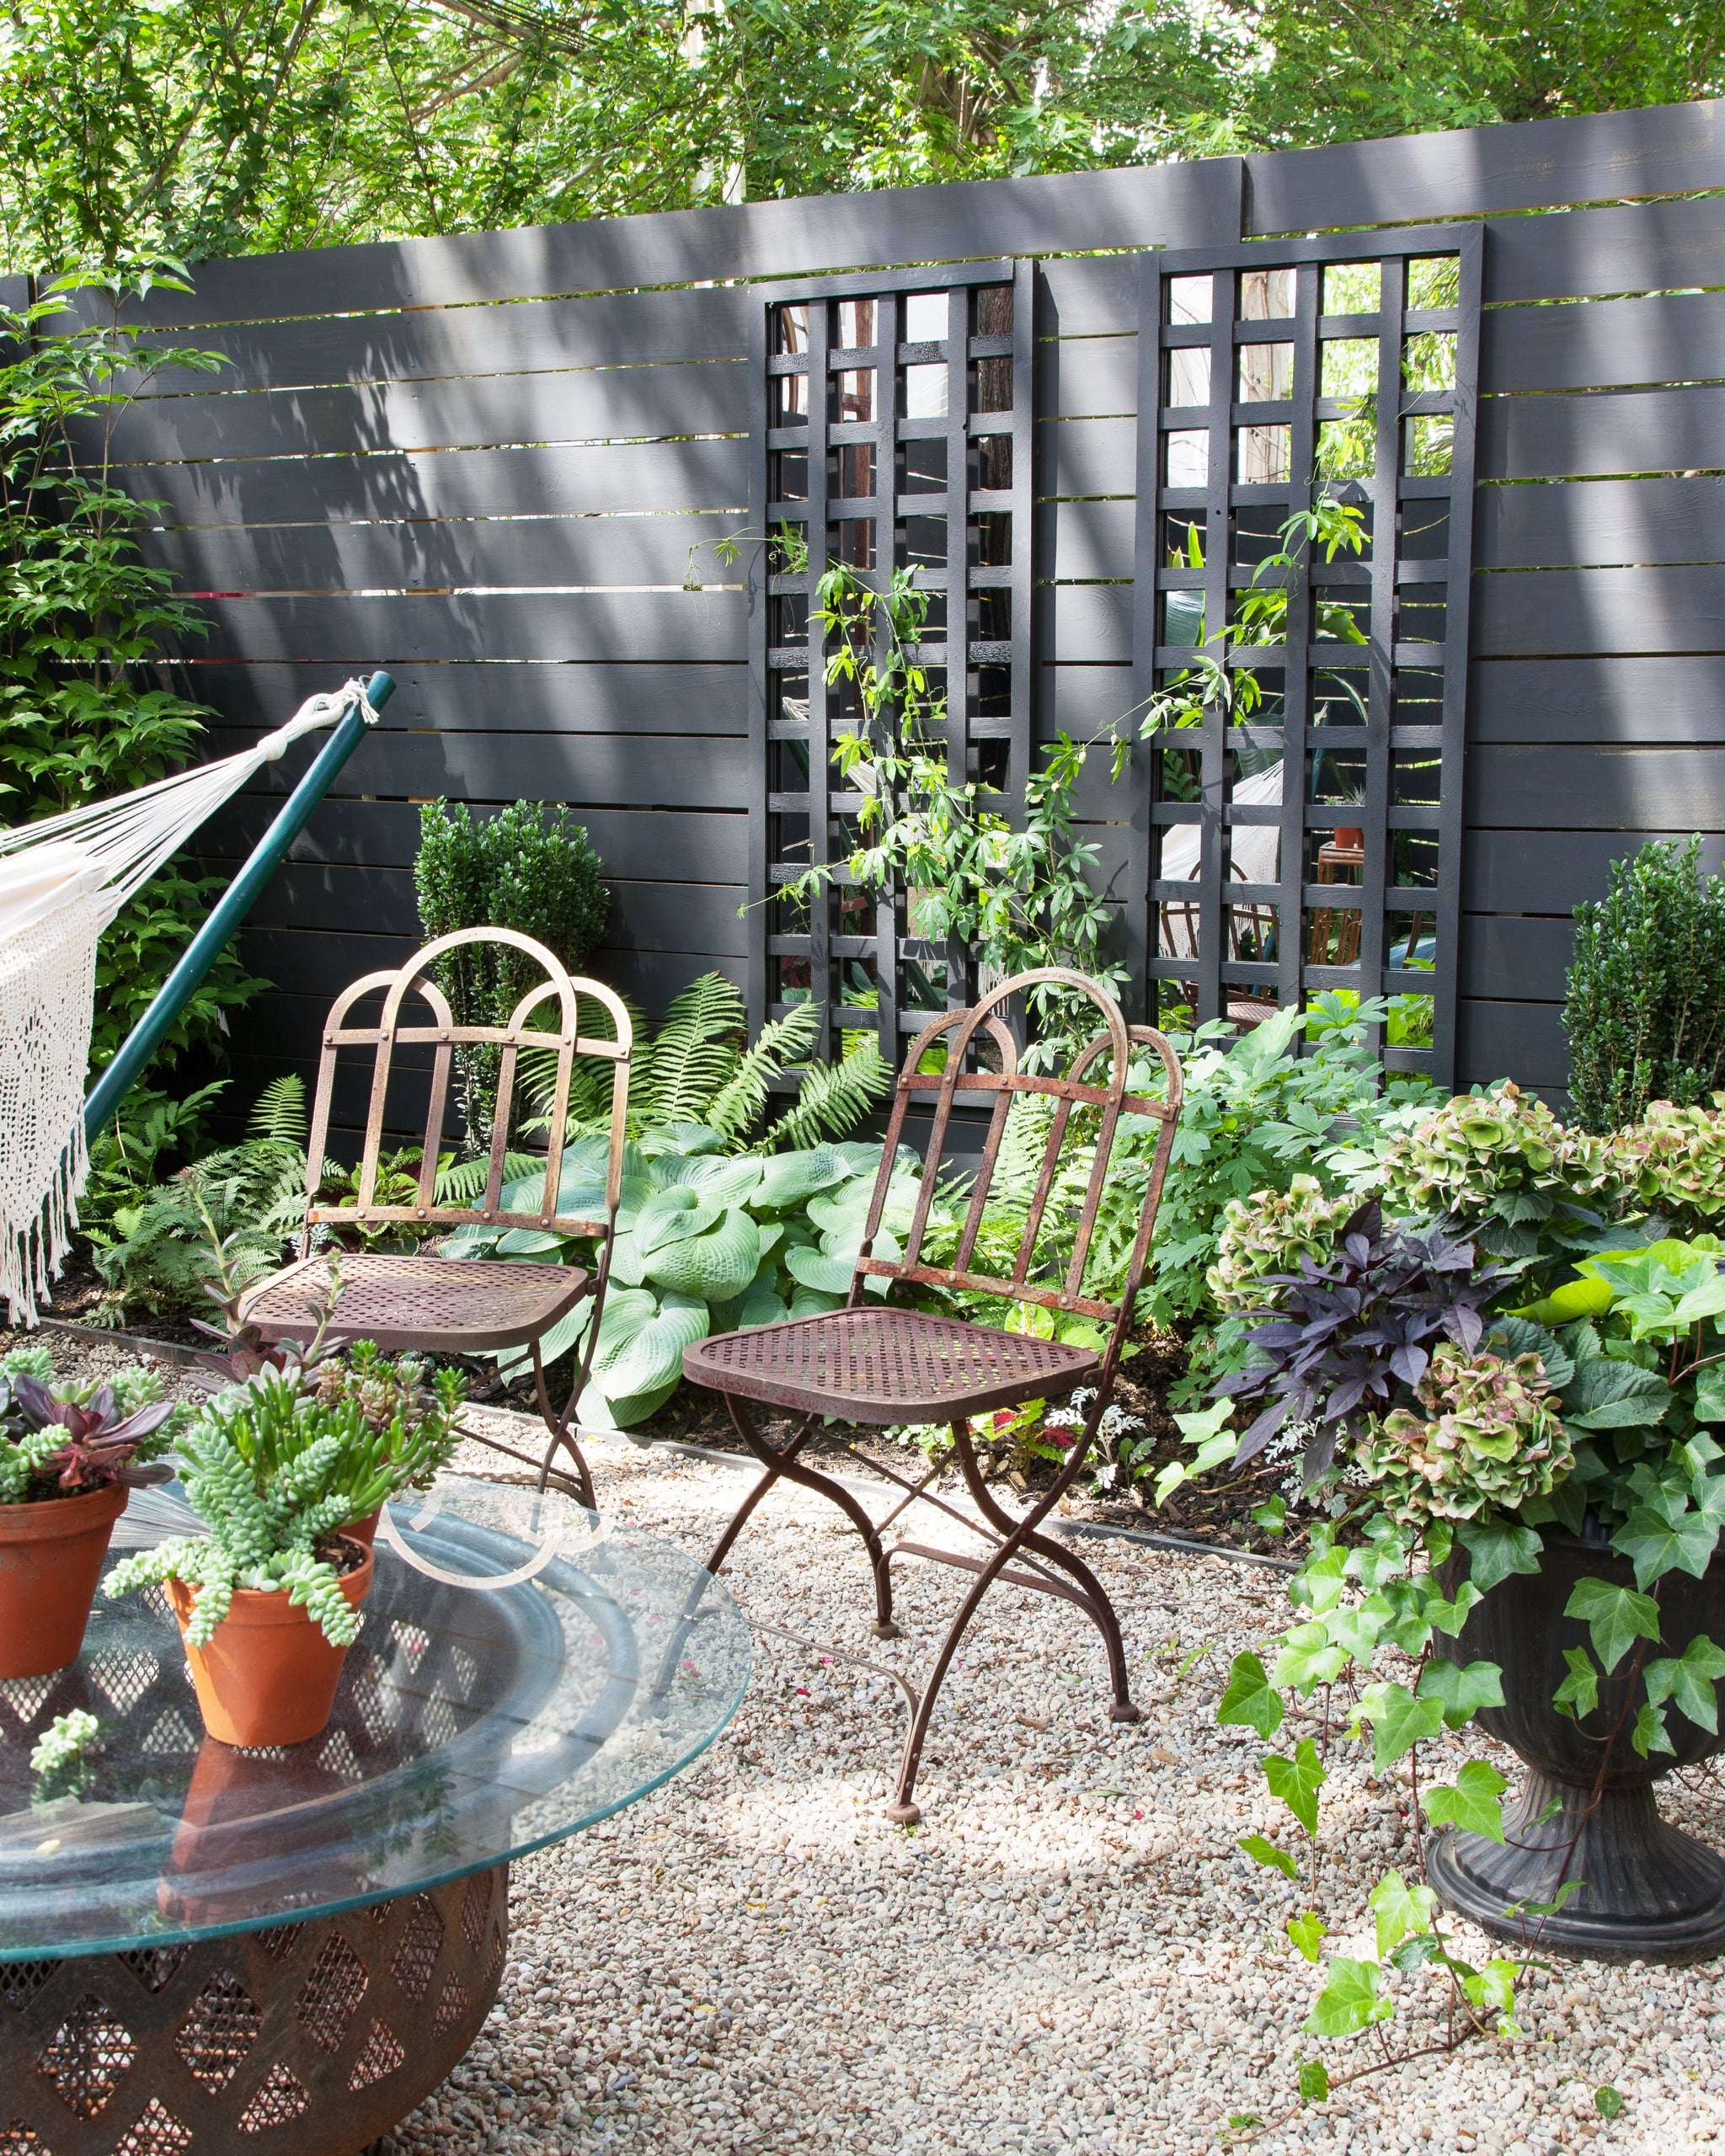 Outdoor Privacy Solutions For The Modern Home Backyard garden ne demek